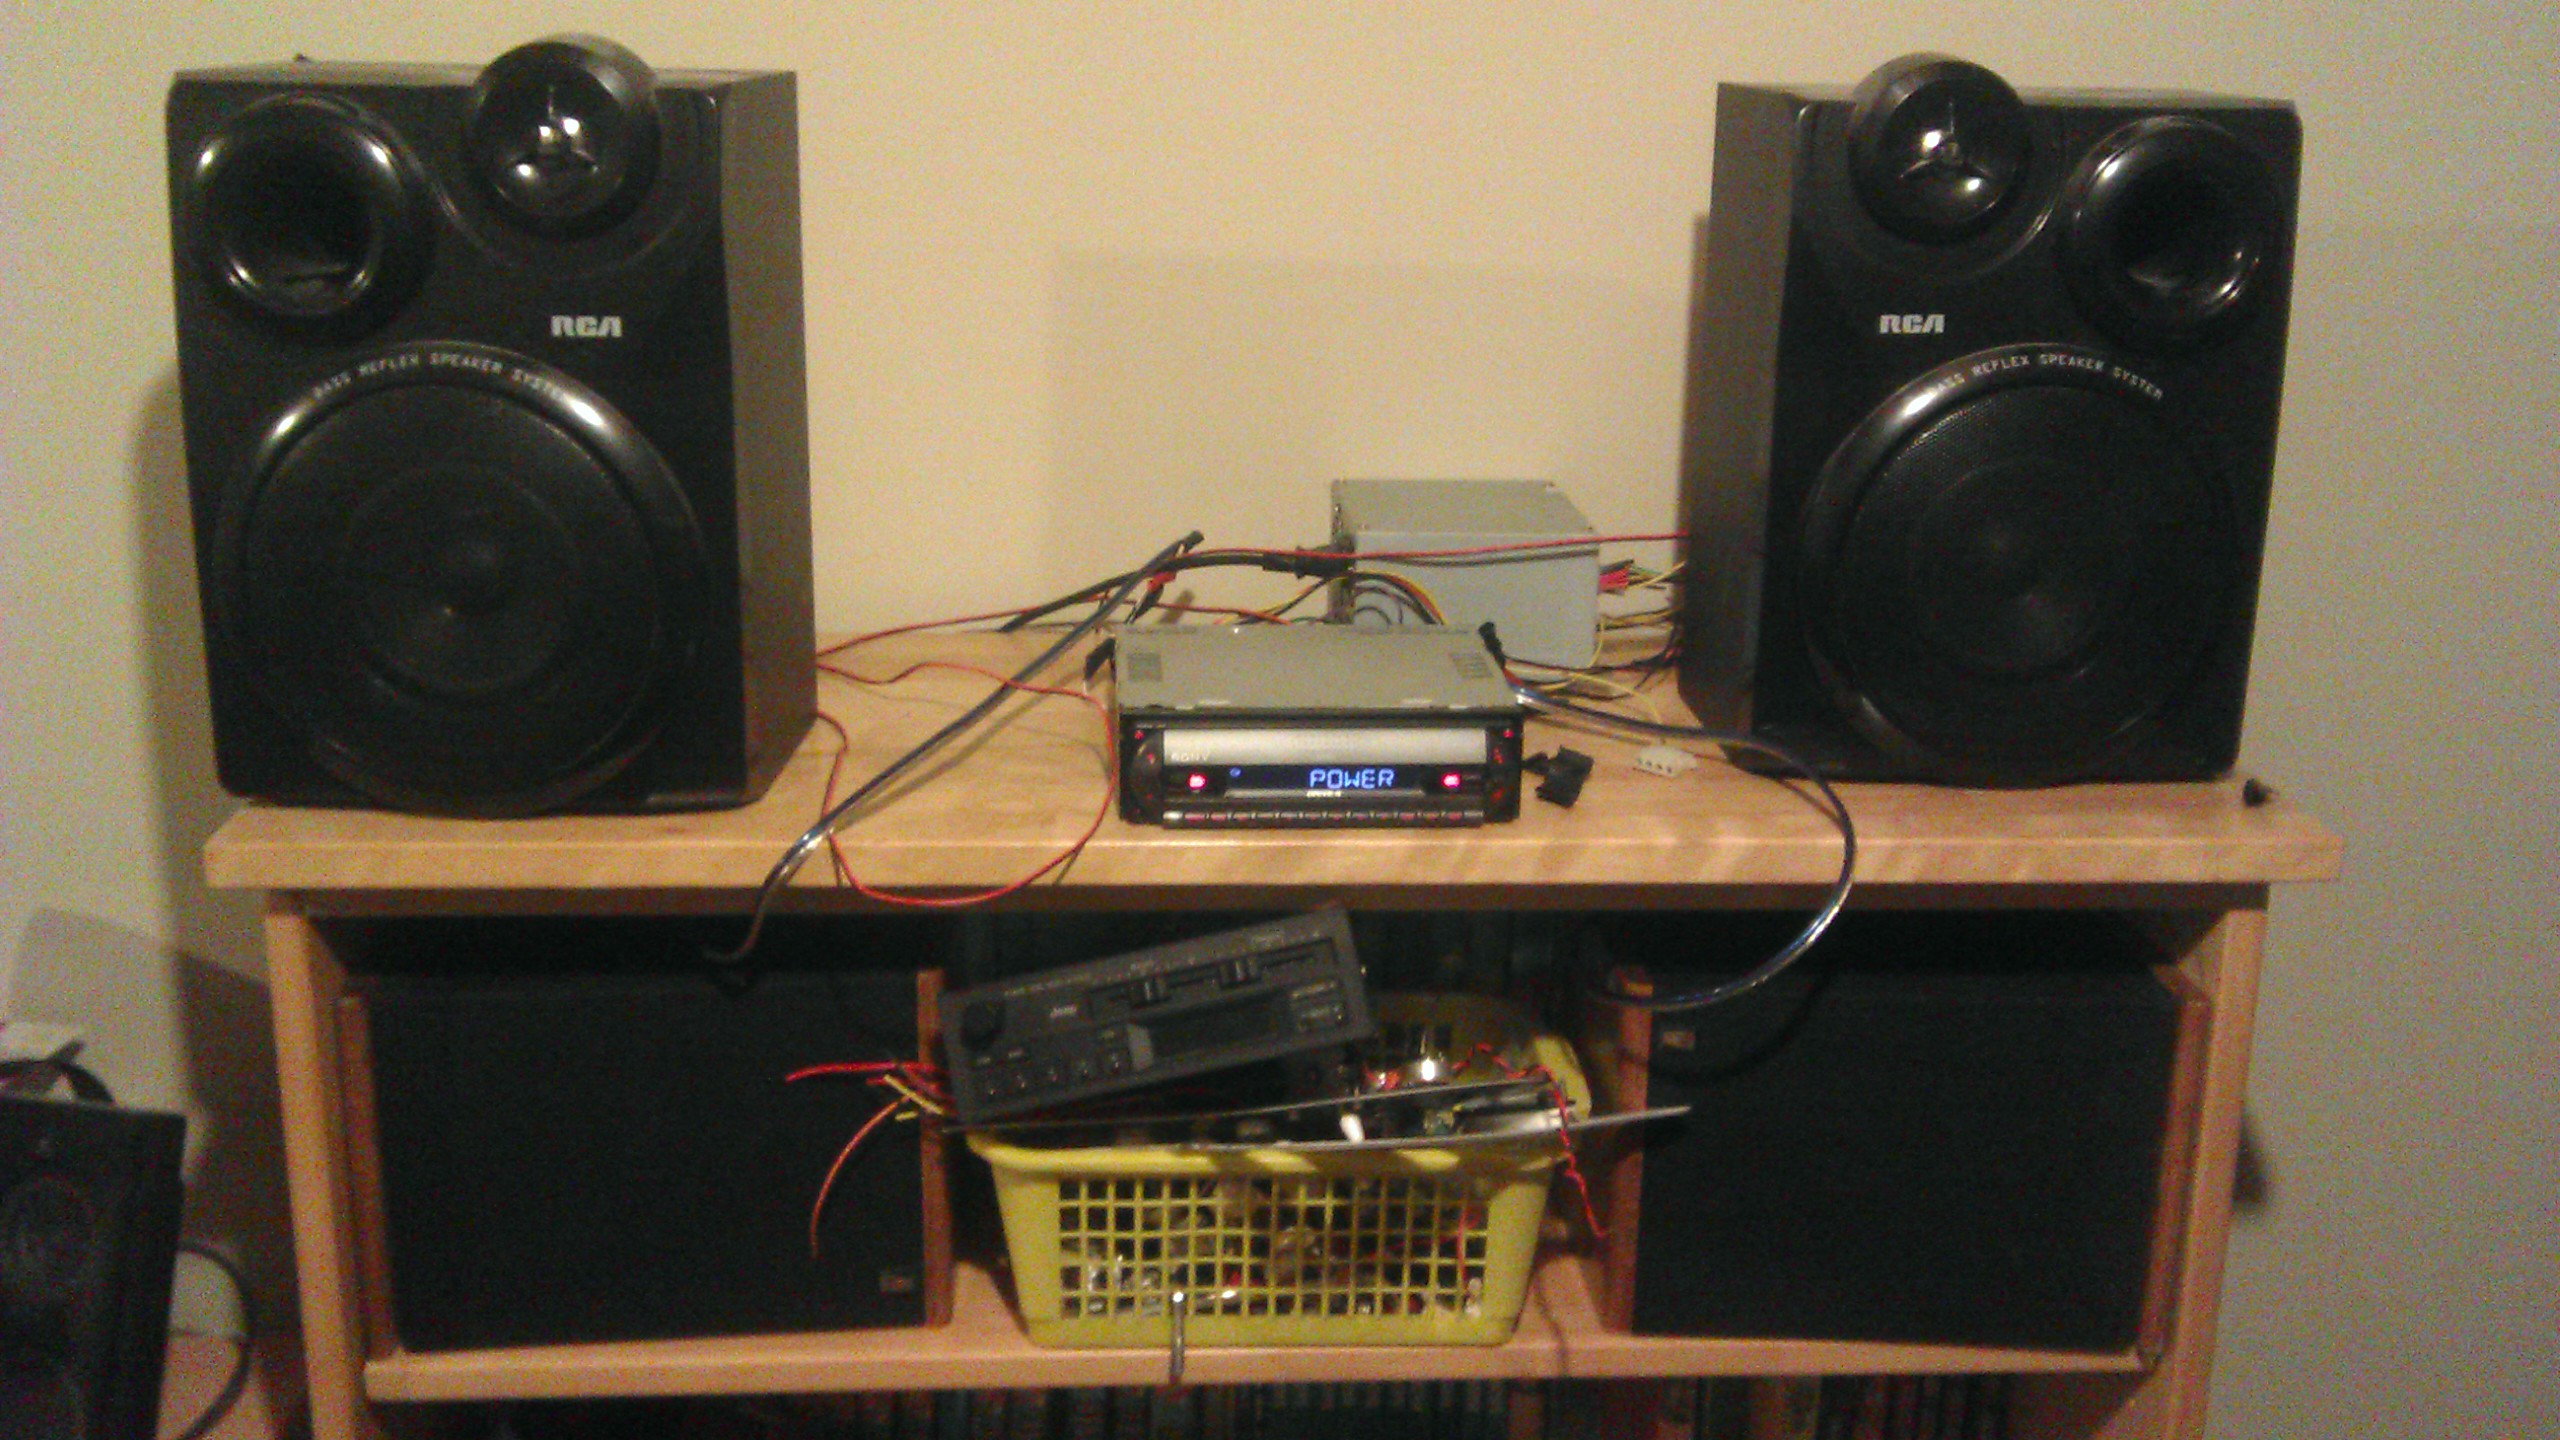 wiring car audio monitor wiring diagrams wni wiring car audio monitor [ 2560 x 1440 Pixel ]